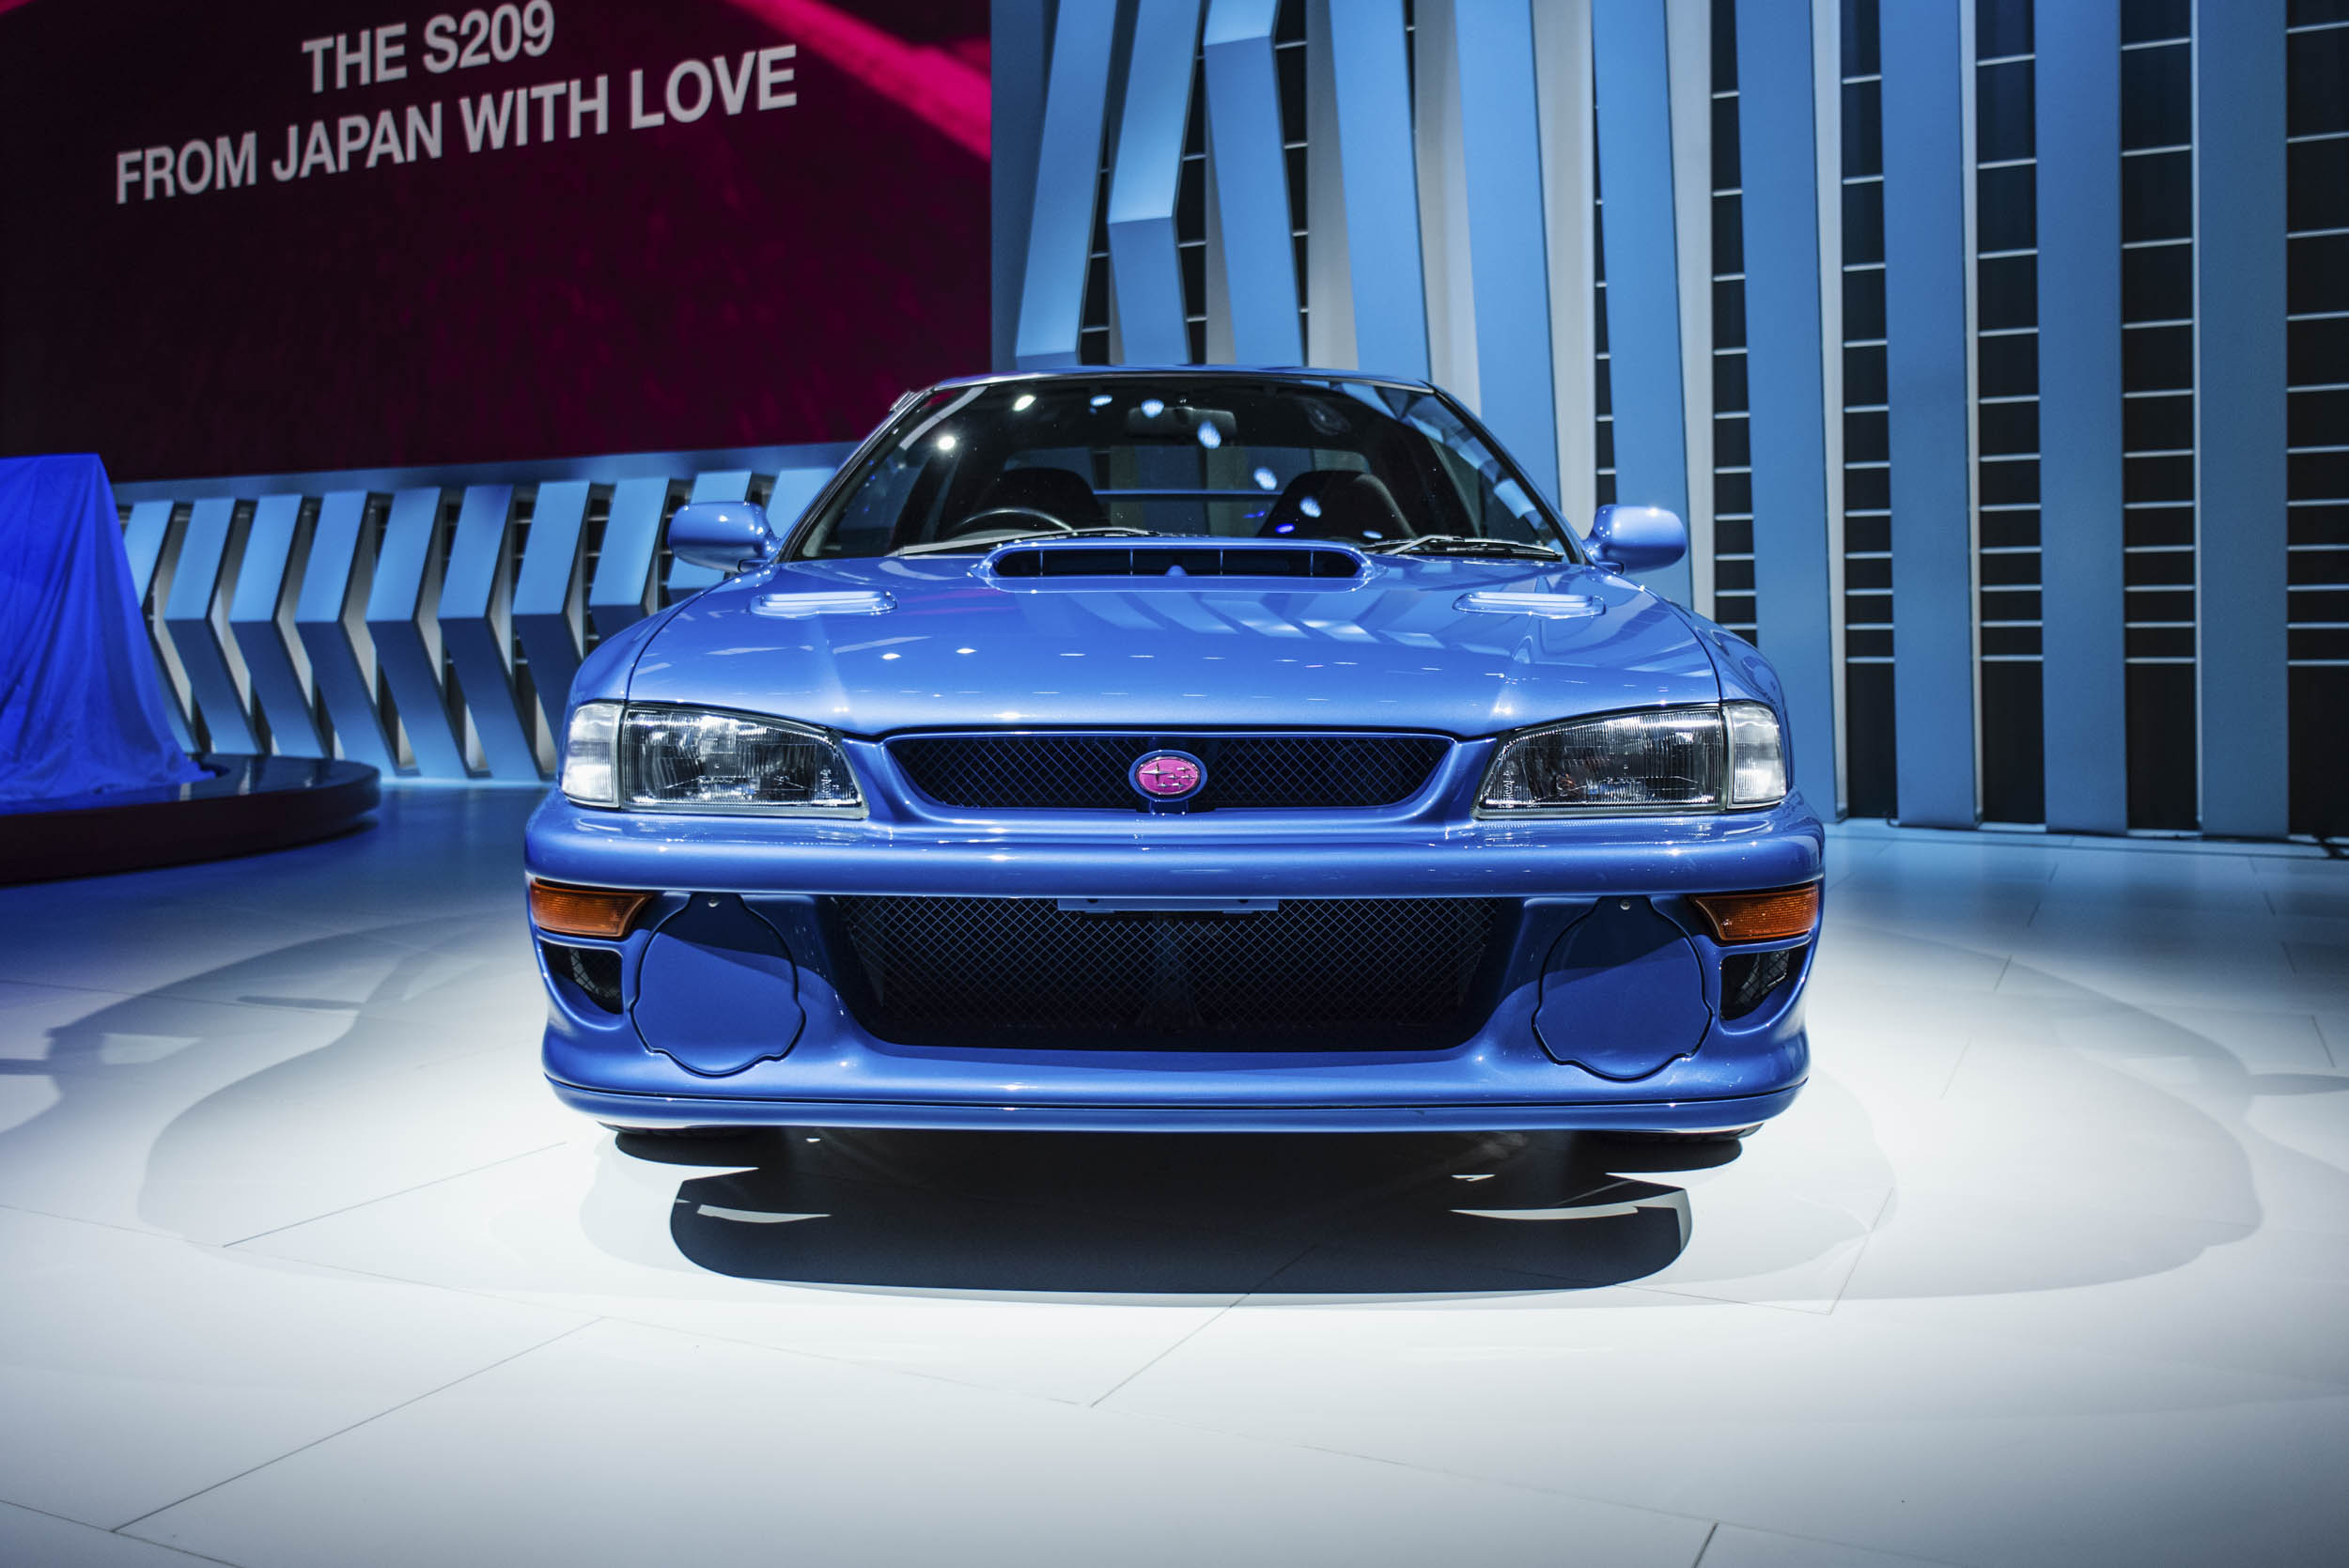 1998 Subaru 22B front